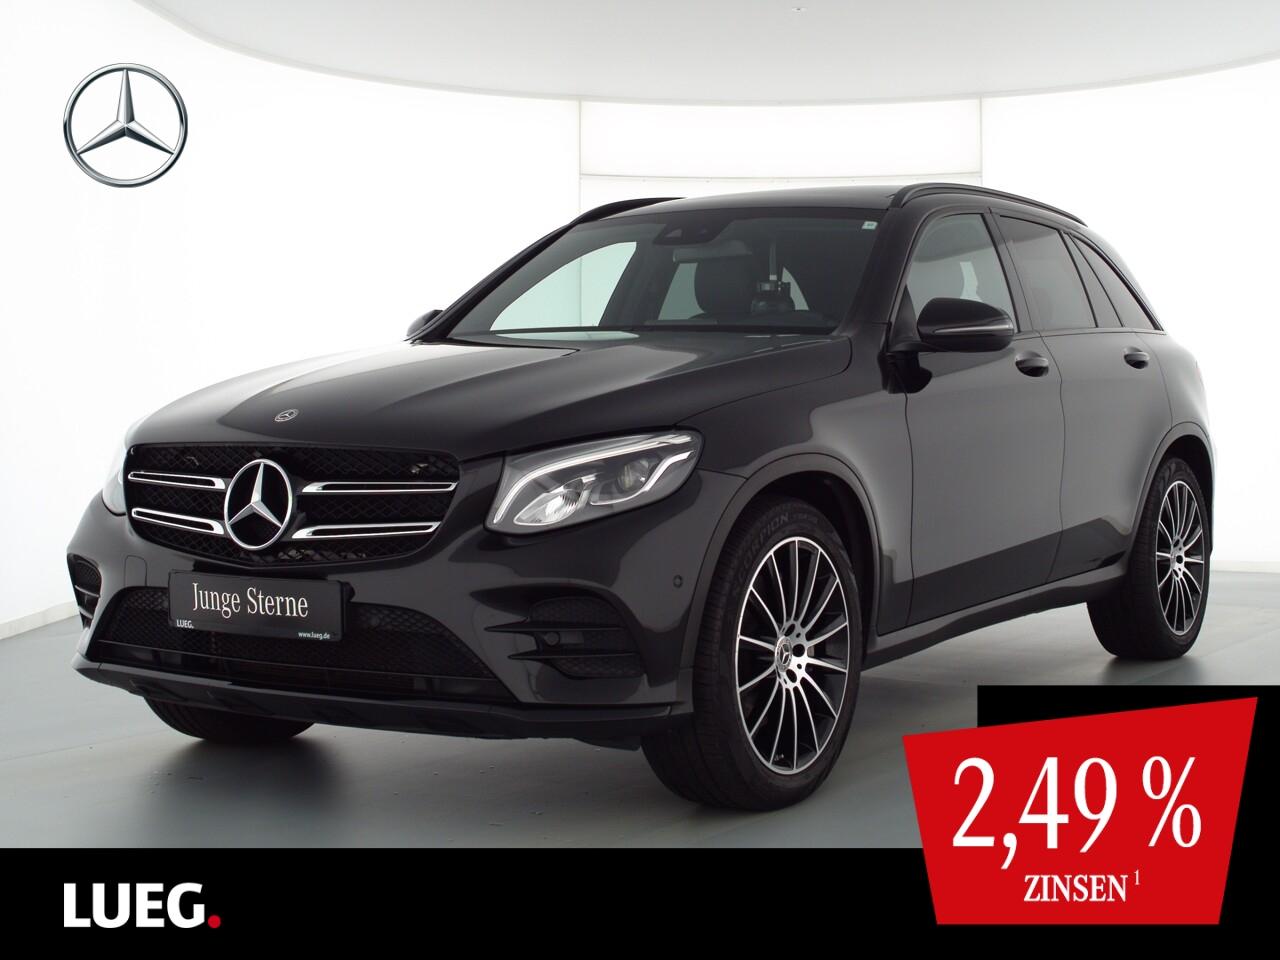 Mercedes-Benz GLC 250 4M AMG+COM+Pano+LED+AHK+Sthzg+20''+Kamer, Jahr 2018, Benzin